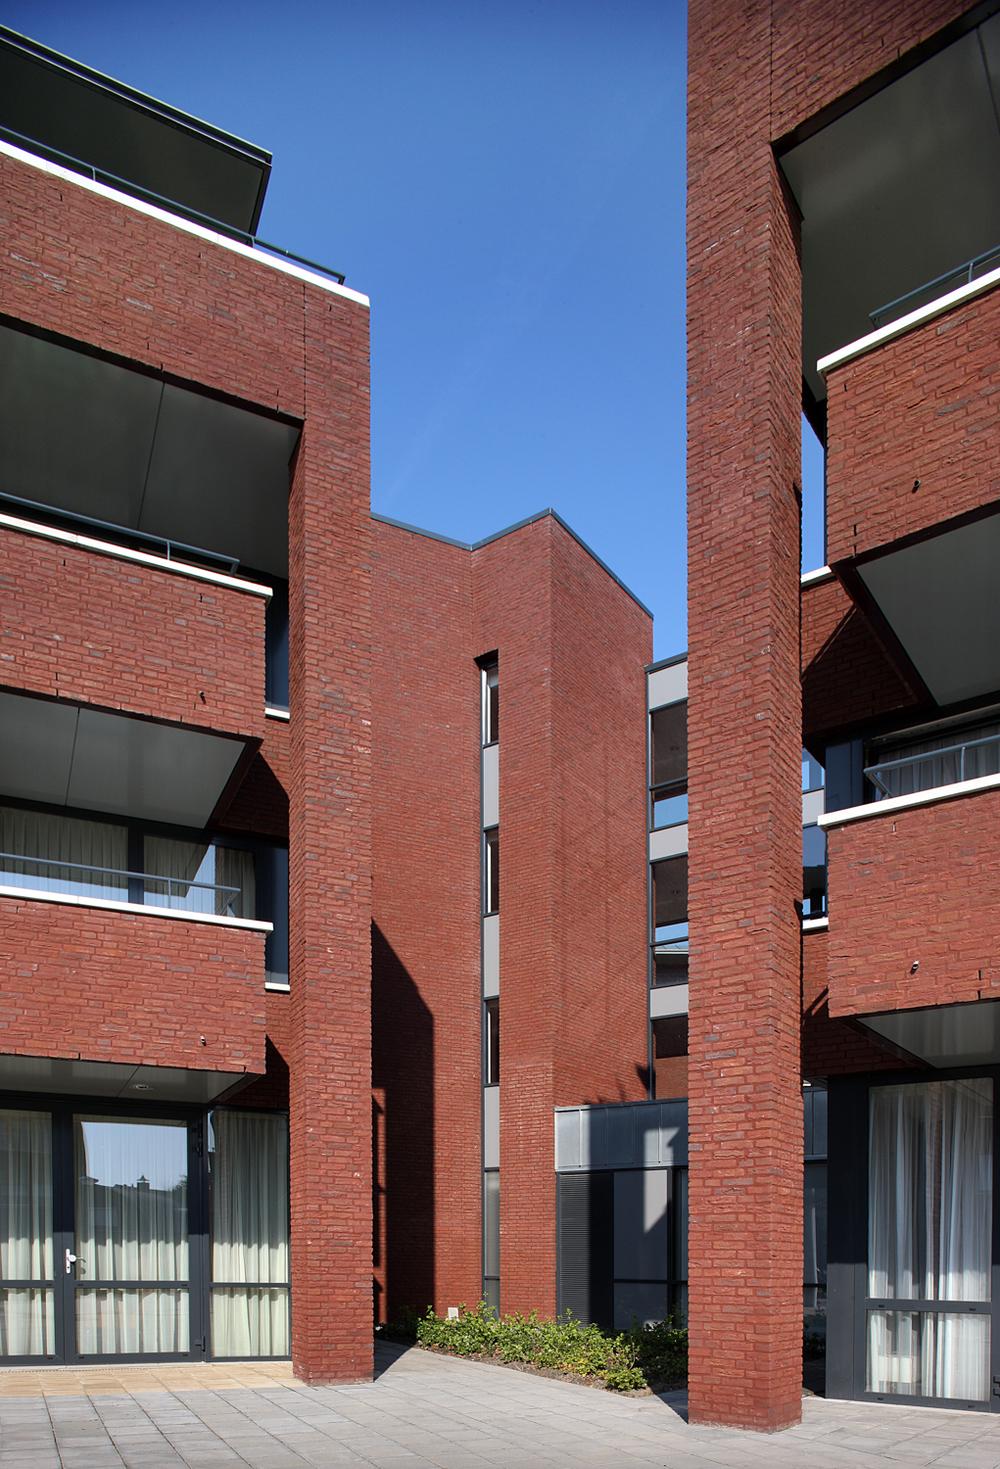 Woonzorgcentrum Kerkakkers Rucphen